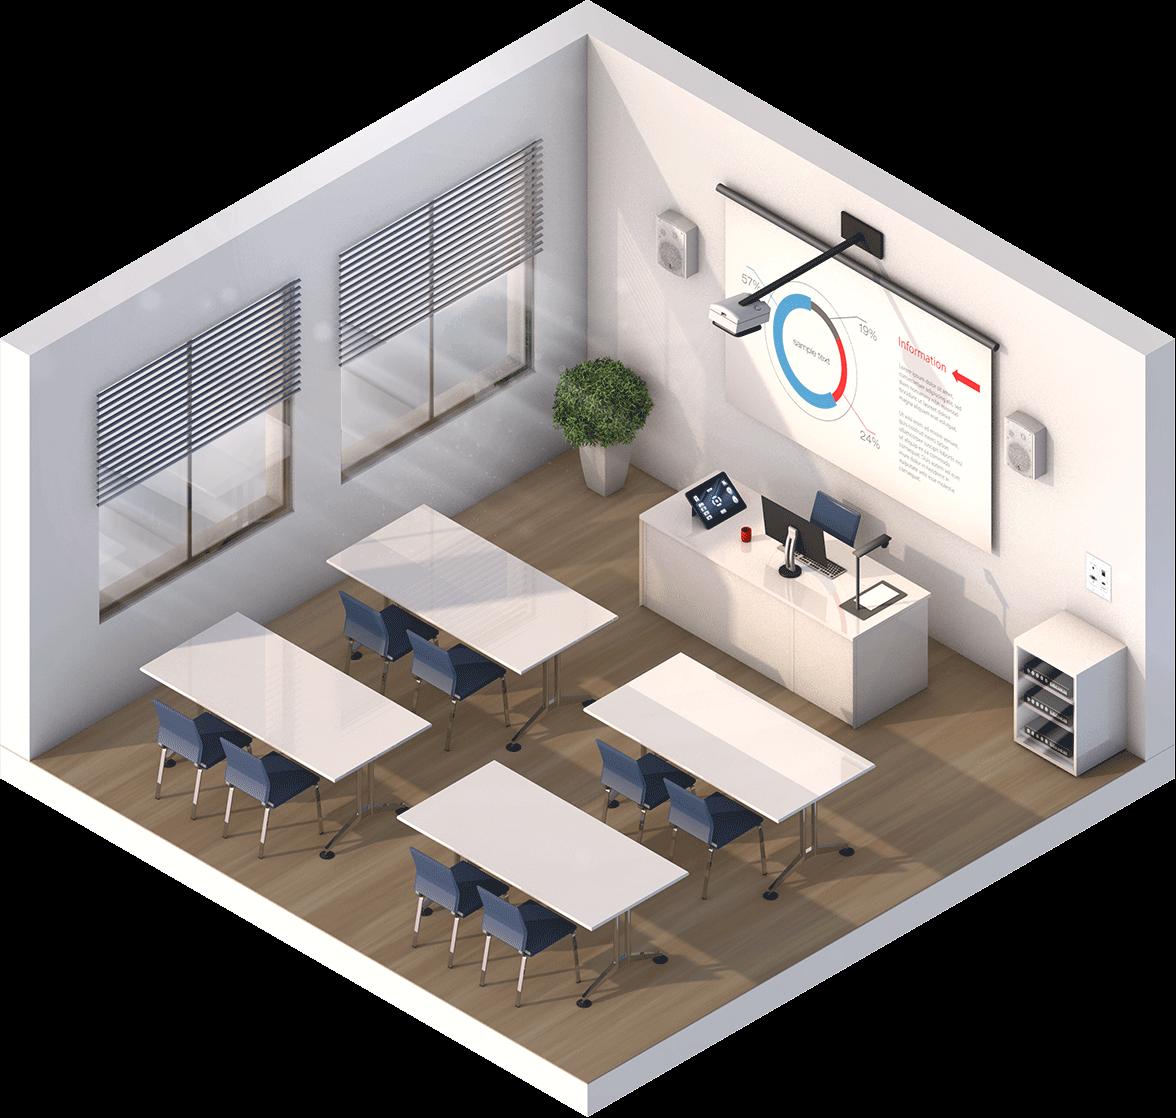 Kramer Collaborative Classroom : Education